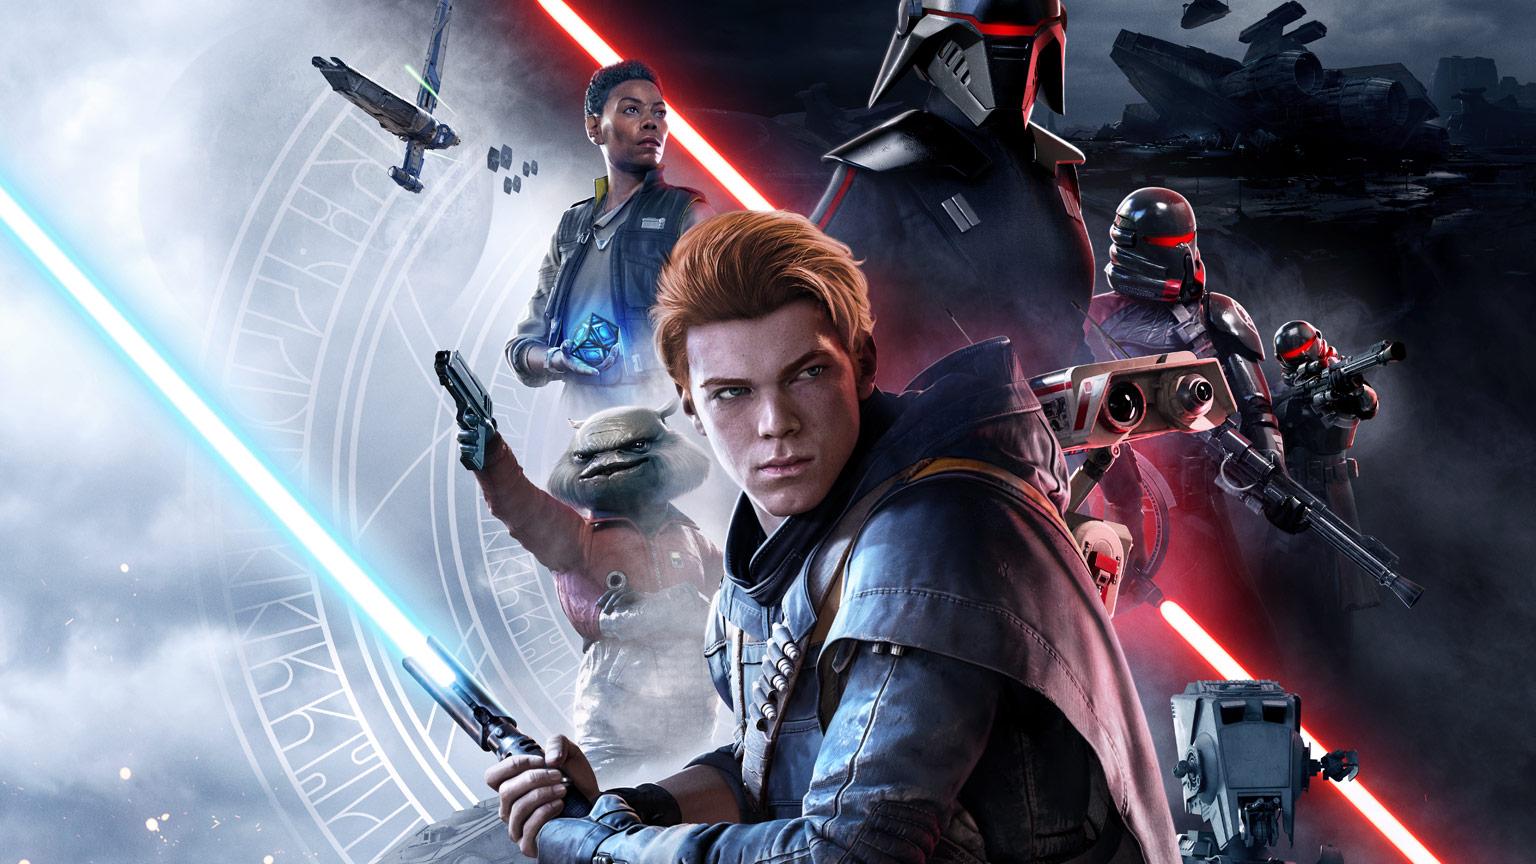 Star Wars Jedi: Fallen Order: Побои штурмовиков и необычный паркур